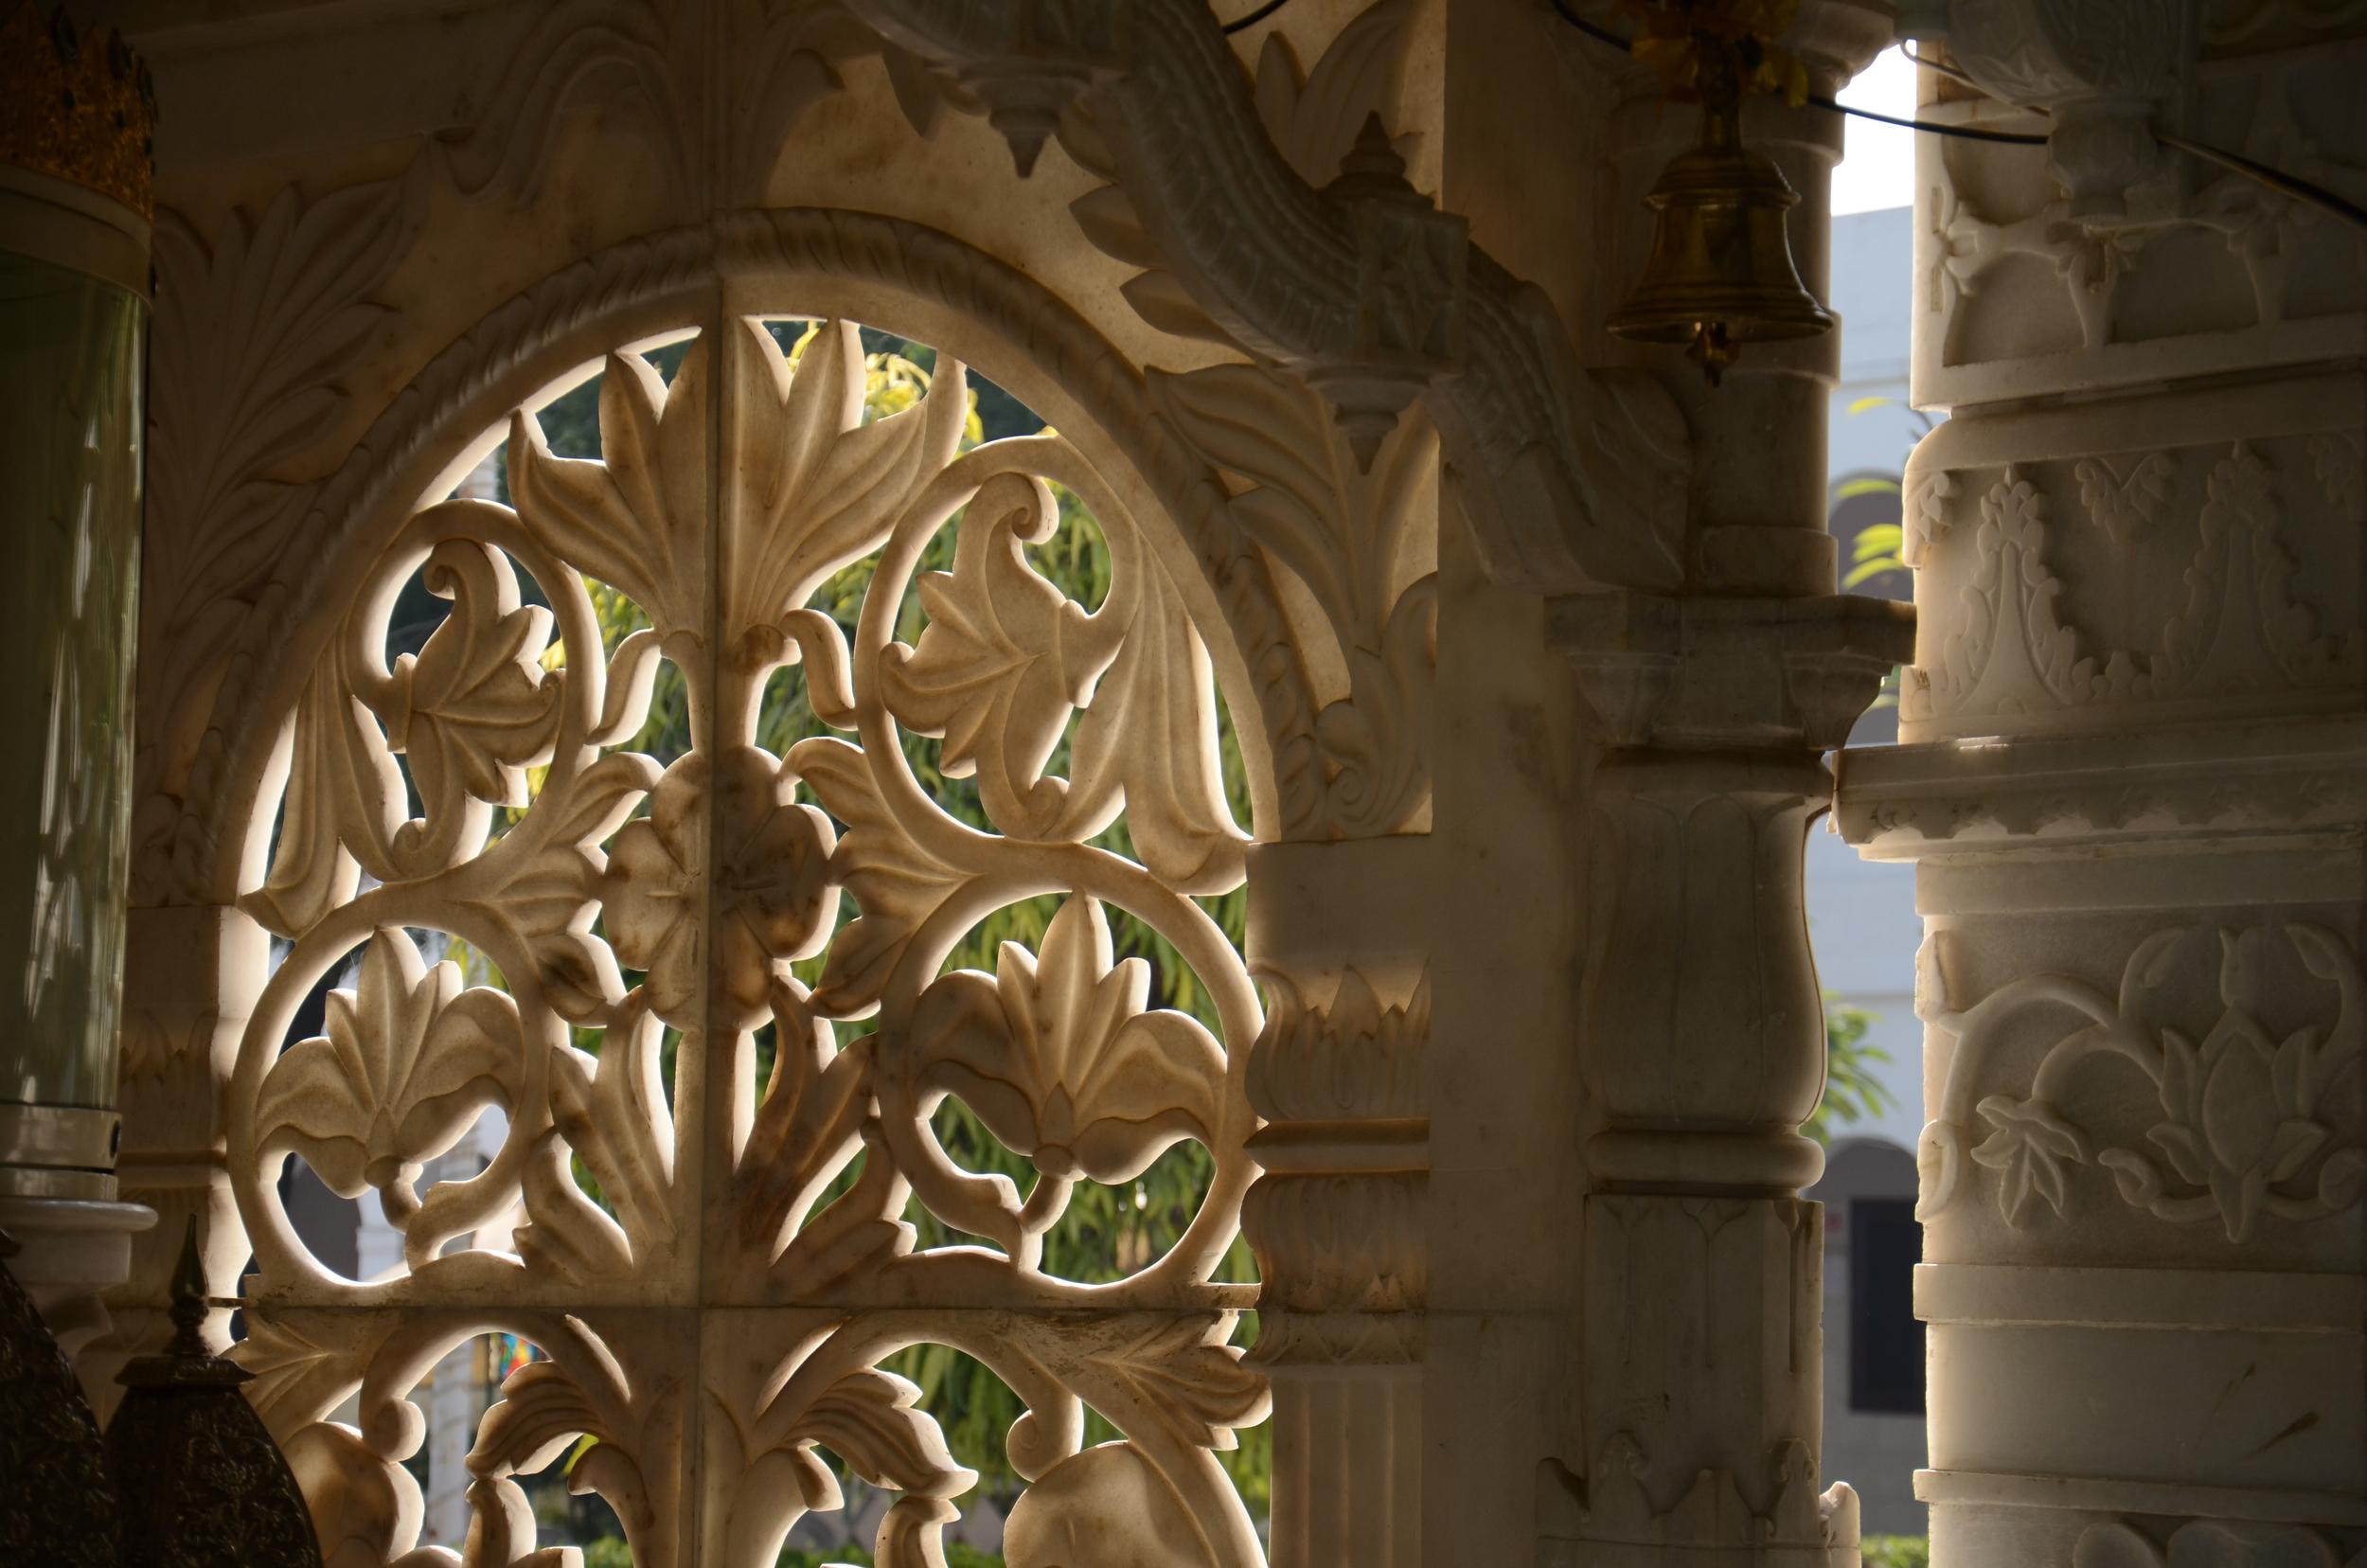 Jain Temple carvings